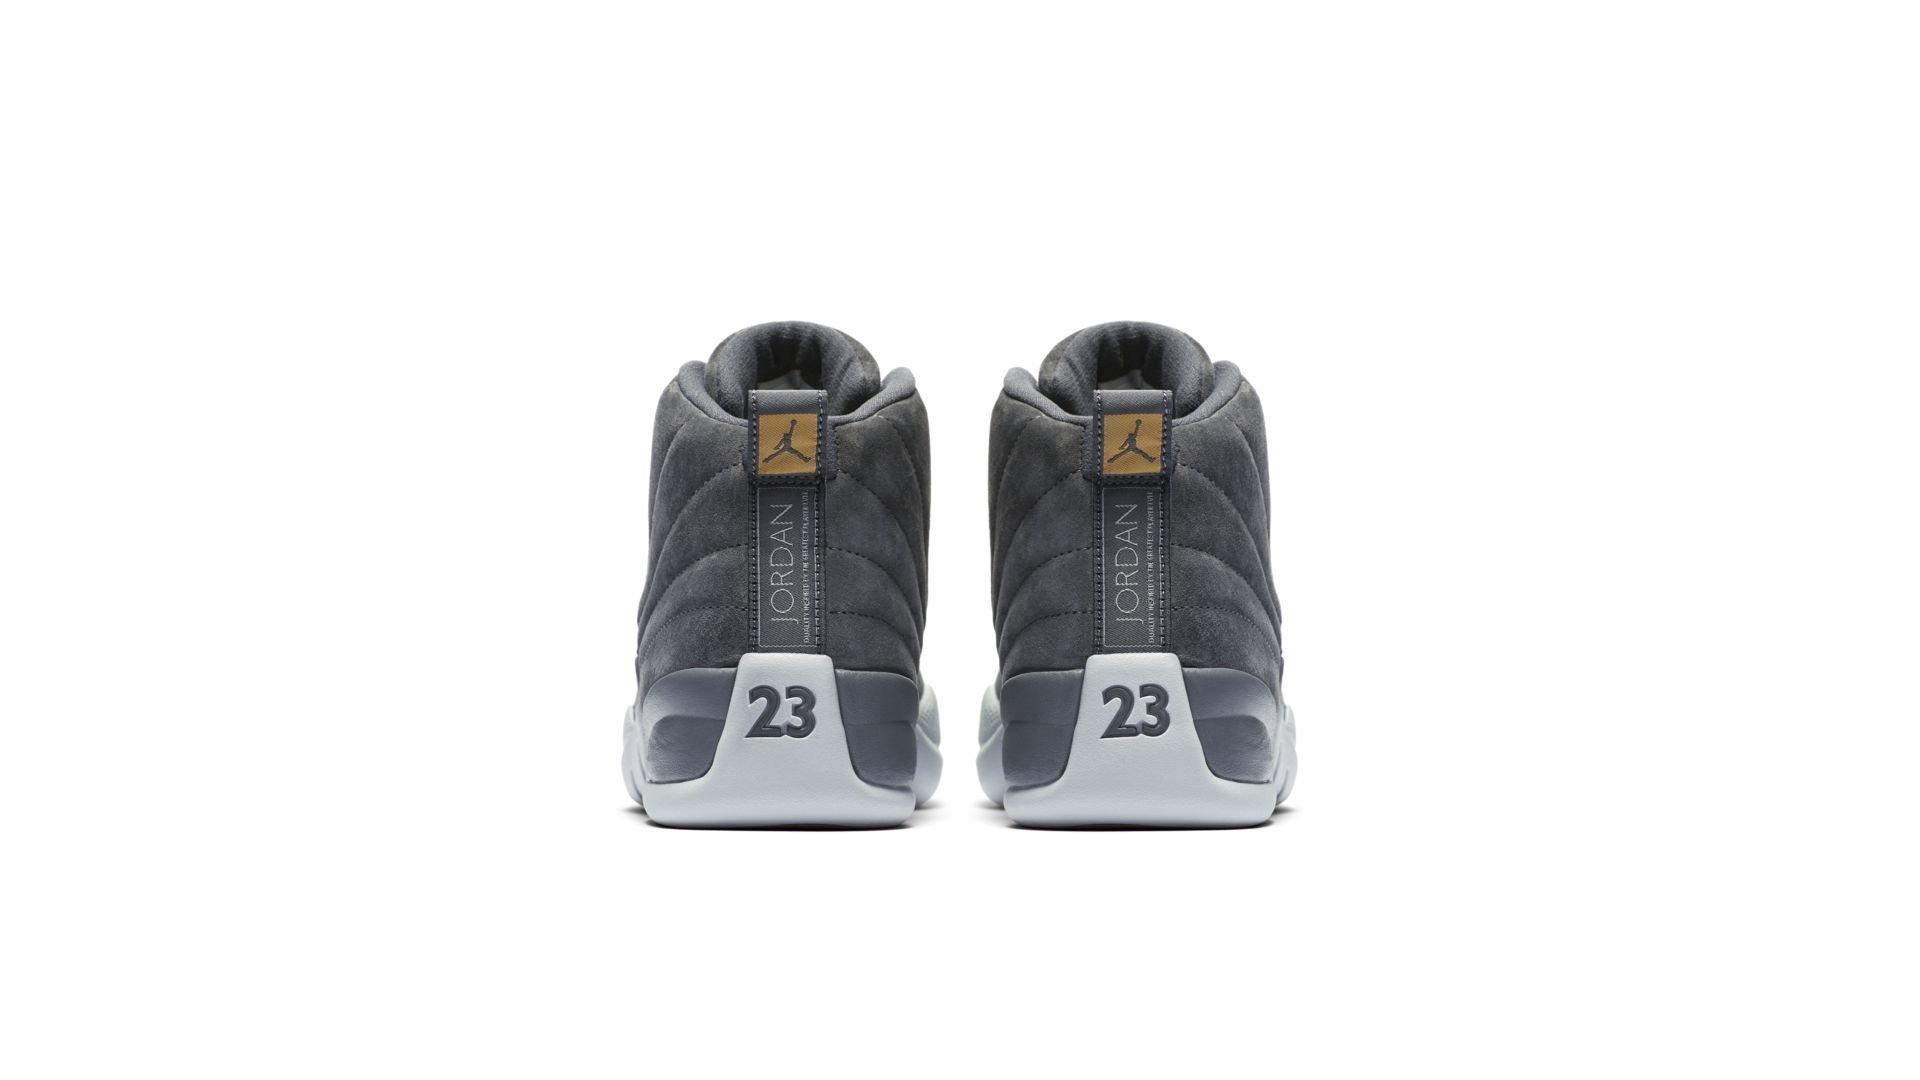 Air Jordan XII Retro 'Dark Grey' (130690-005)